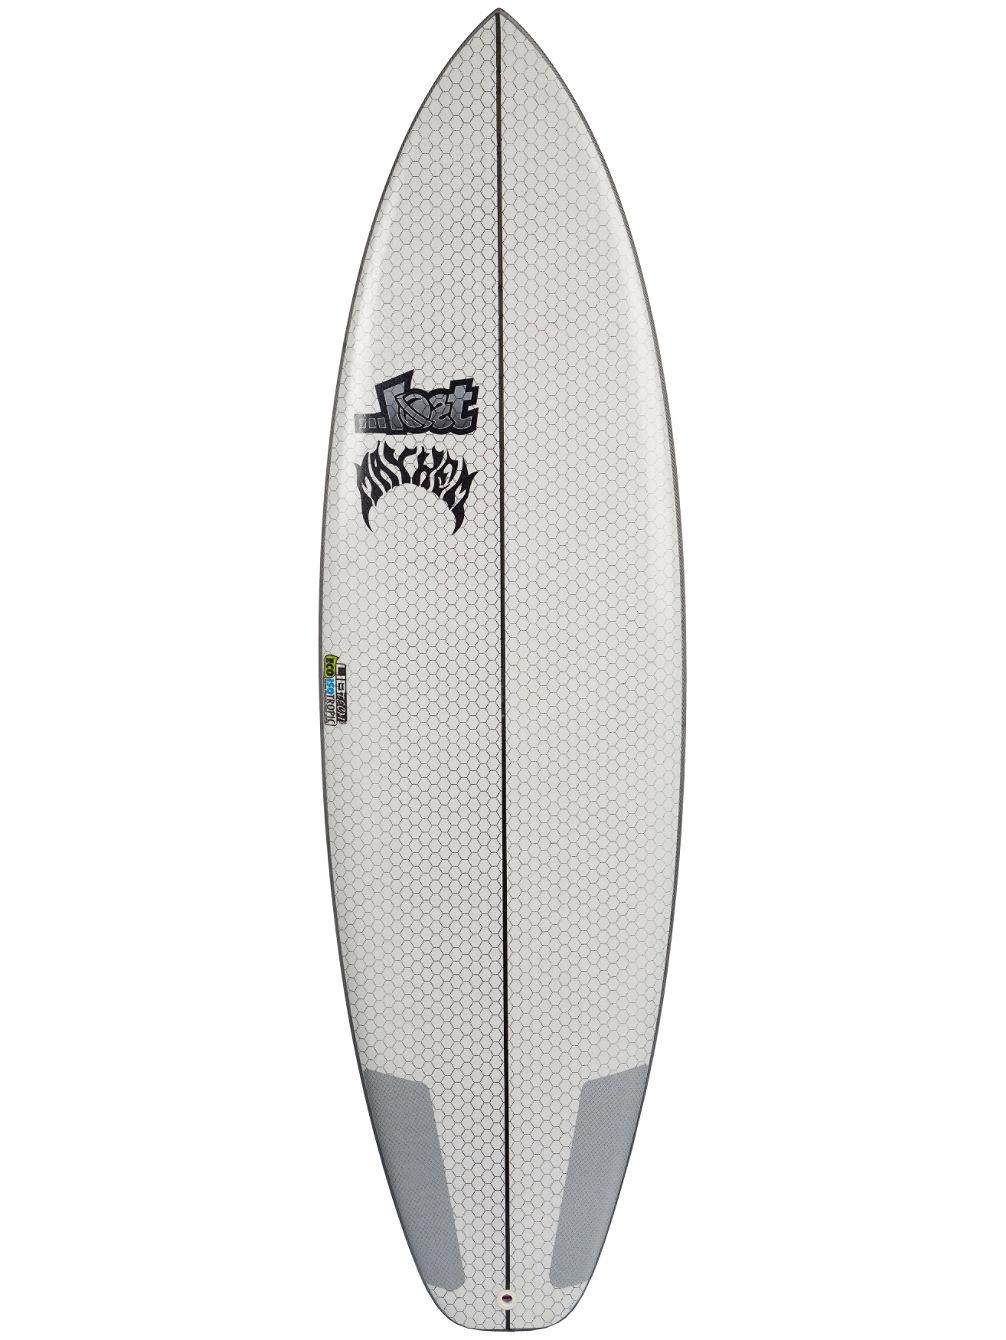 Compra lib tech lib x lost short round 6 39 0 tavola da surf - Misure tavole da surf ...